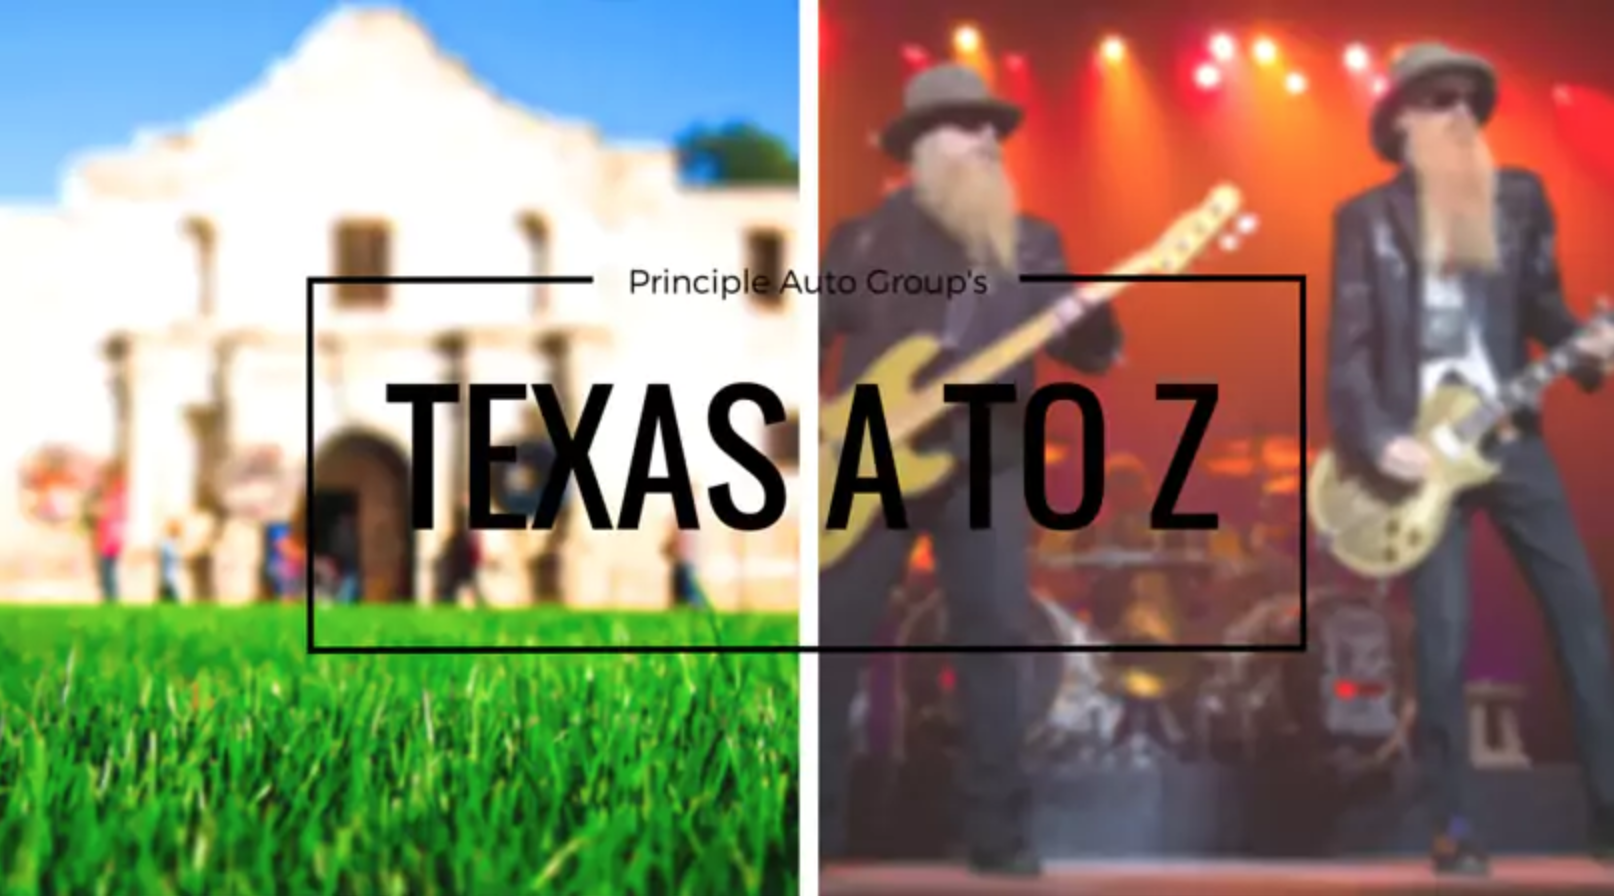 Texas A to Z